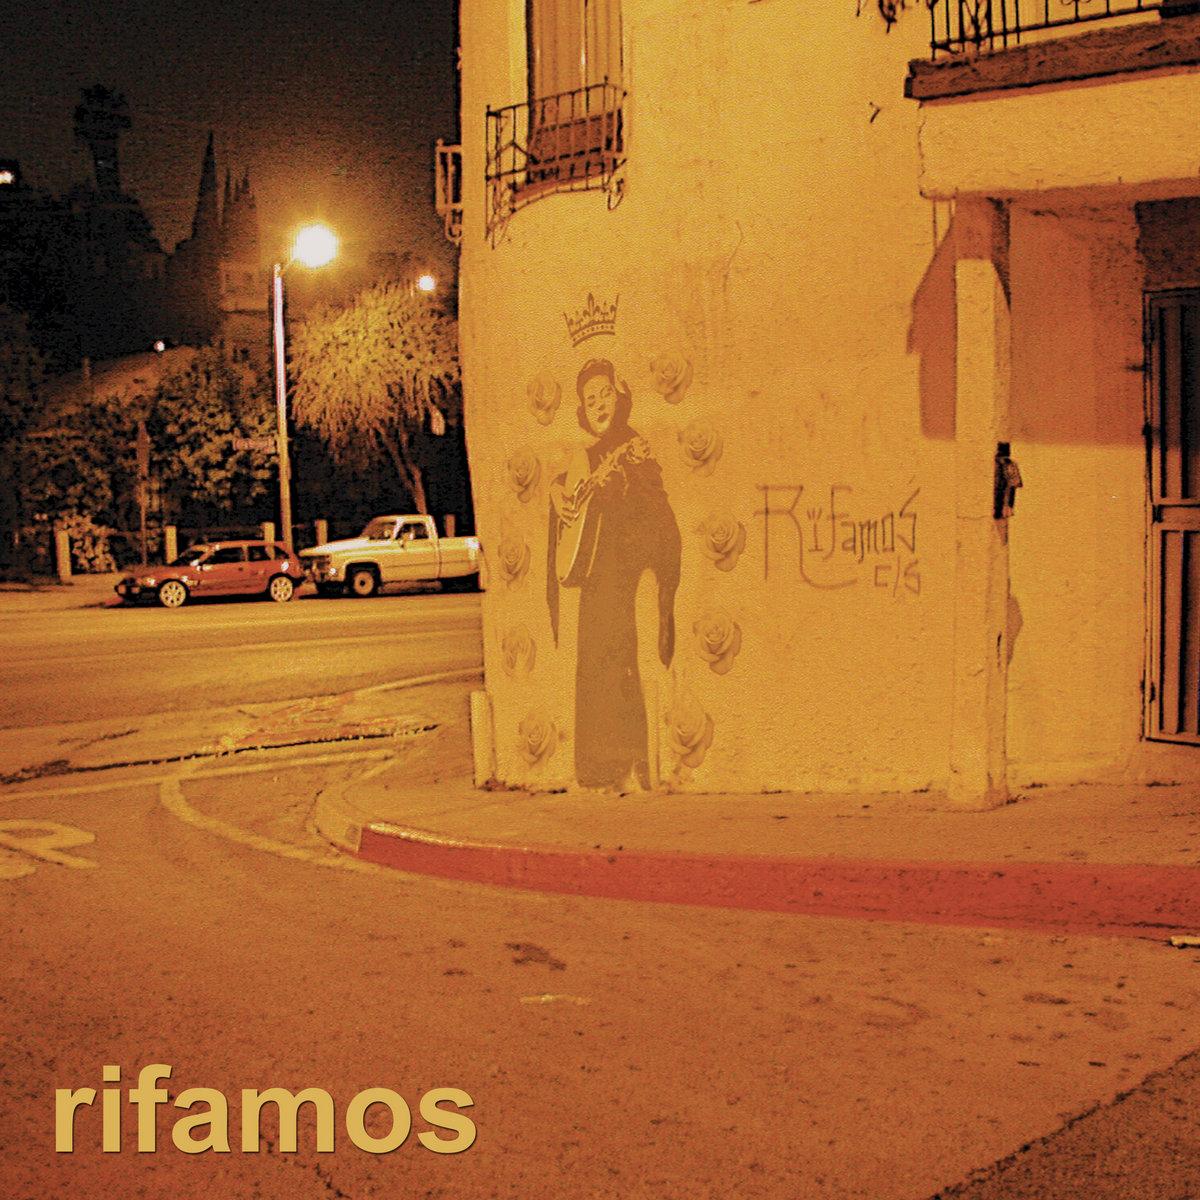 Rifamos | Rifamos | Self-Released